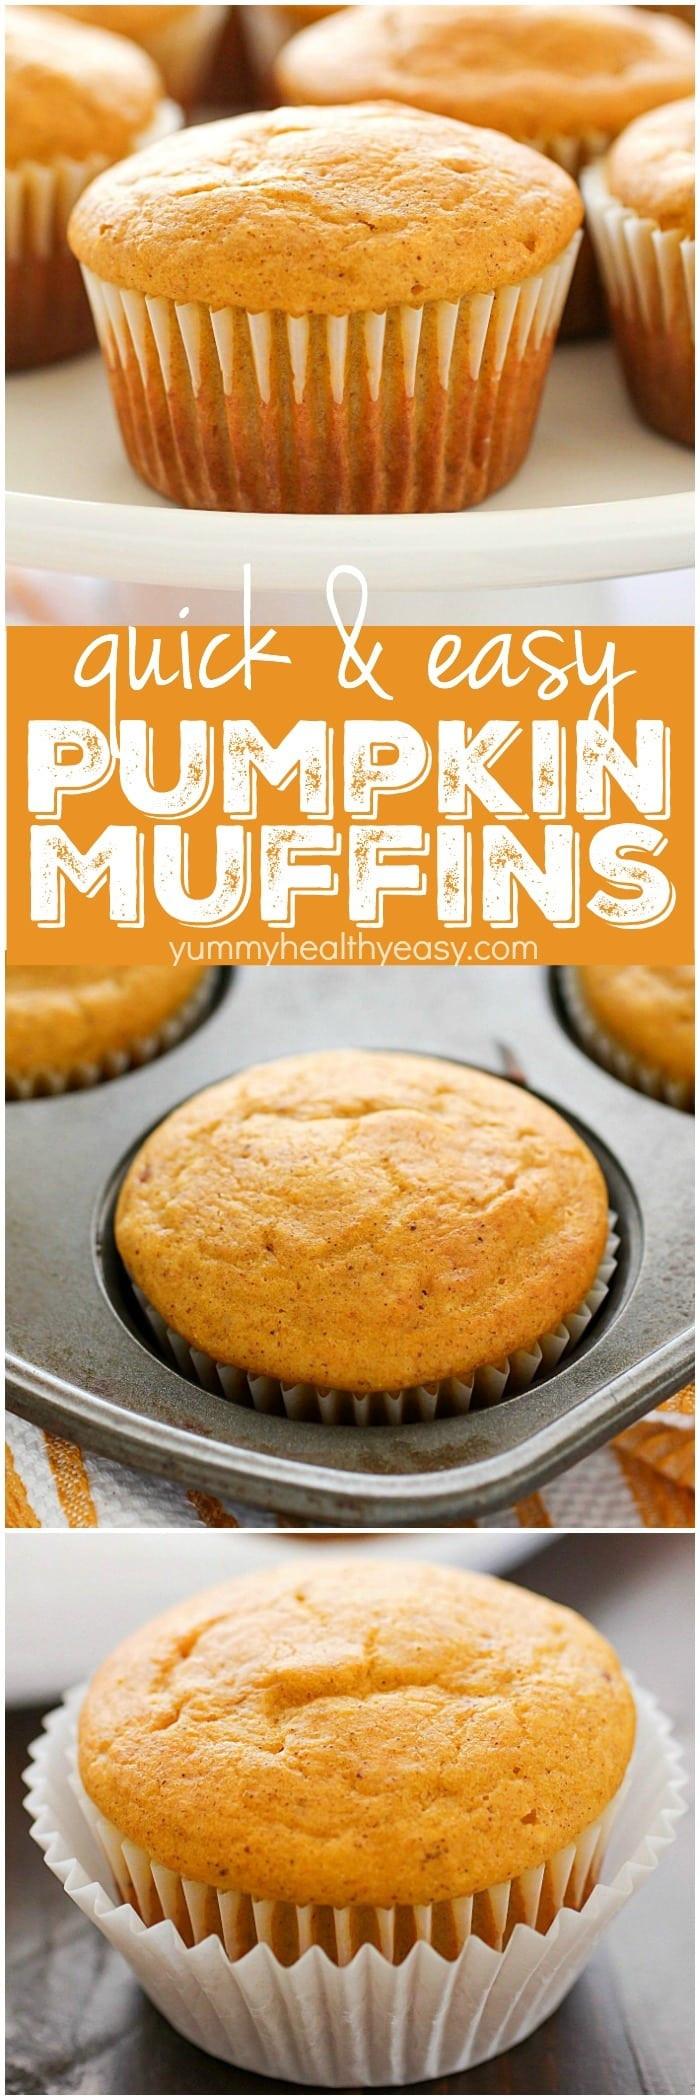 Healthy Pumpkin Recipes Easy  Quick & Easy Pumpkin Muffins Yummy Healthy Easy